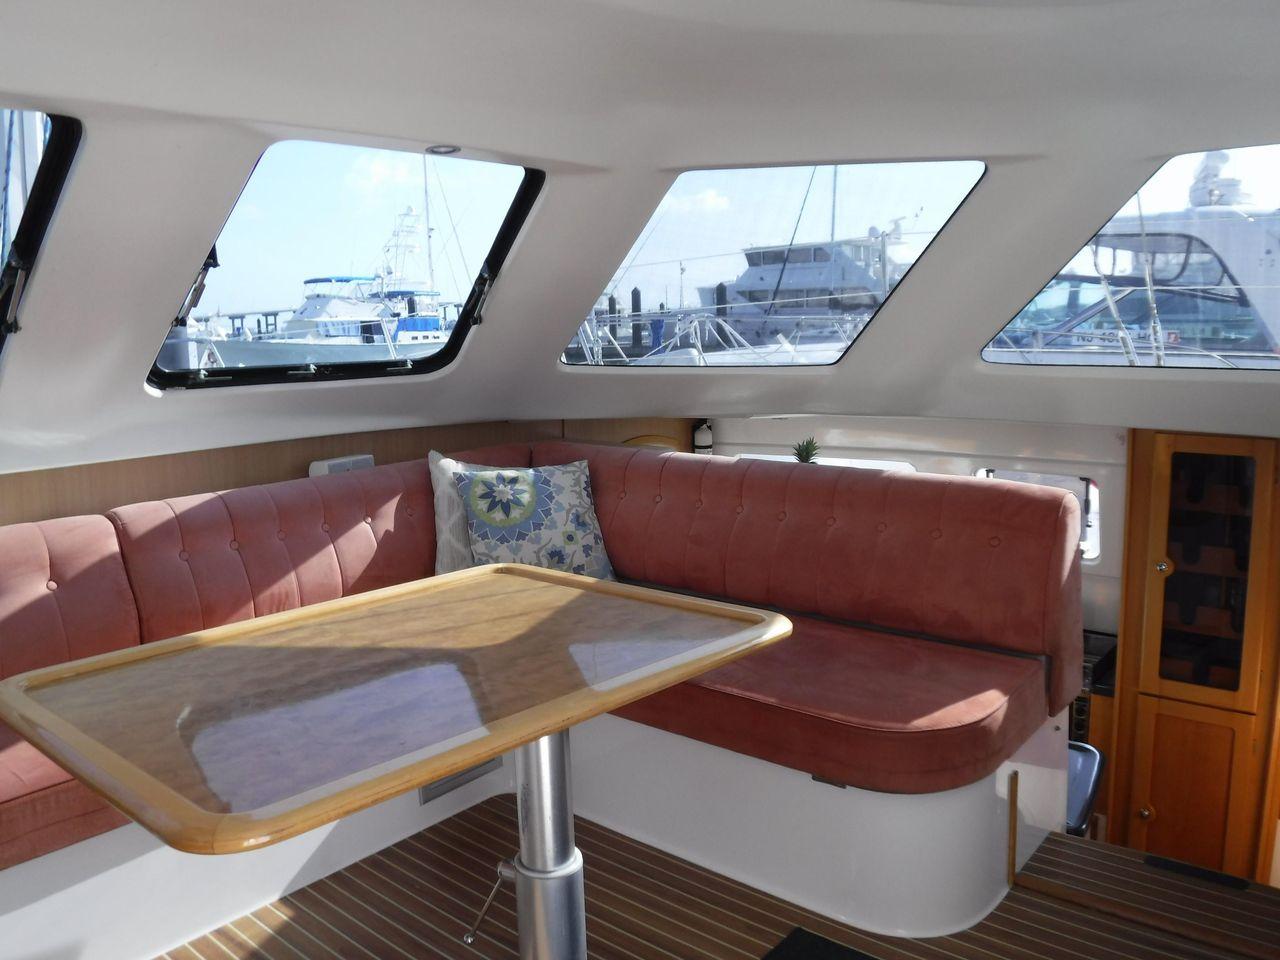 2005 Used Seawind 1160 Catamaran Sailboat For Sale